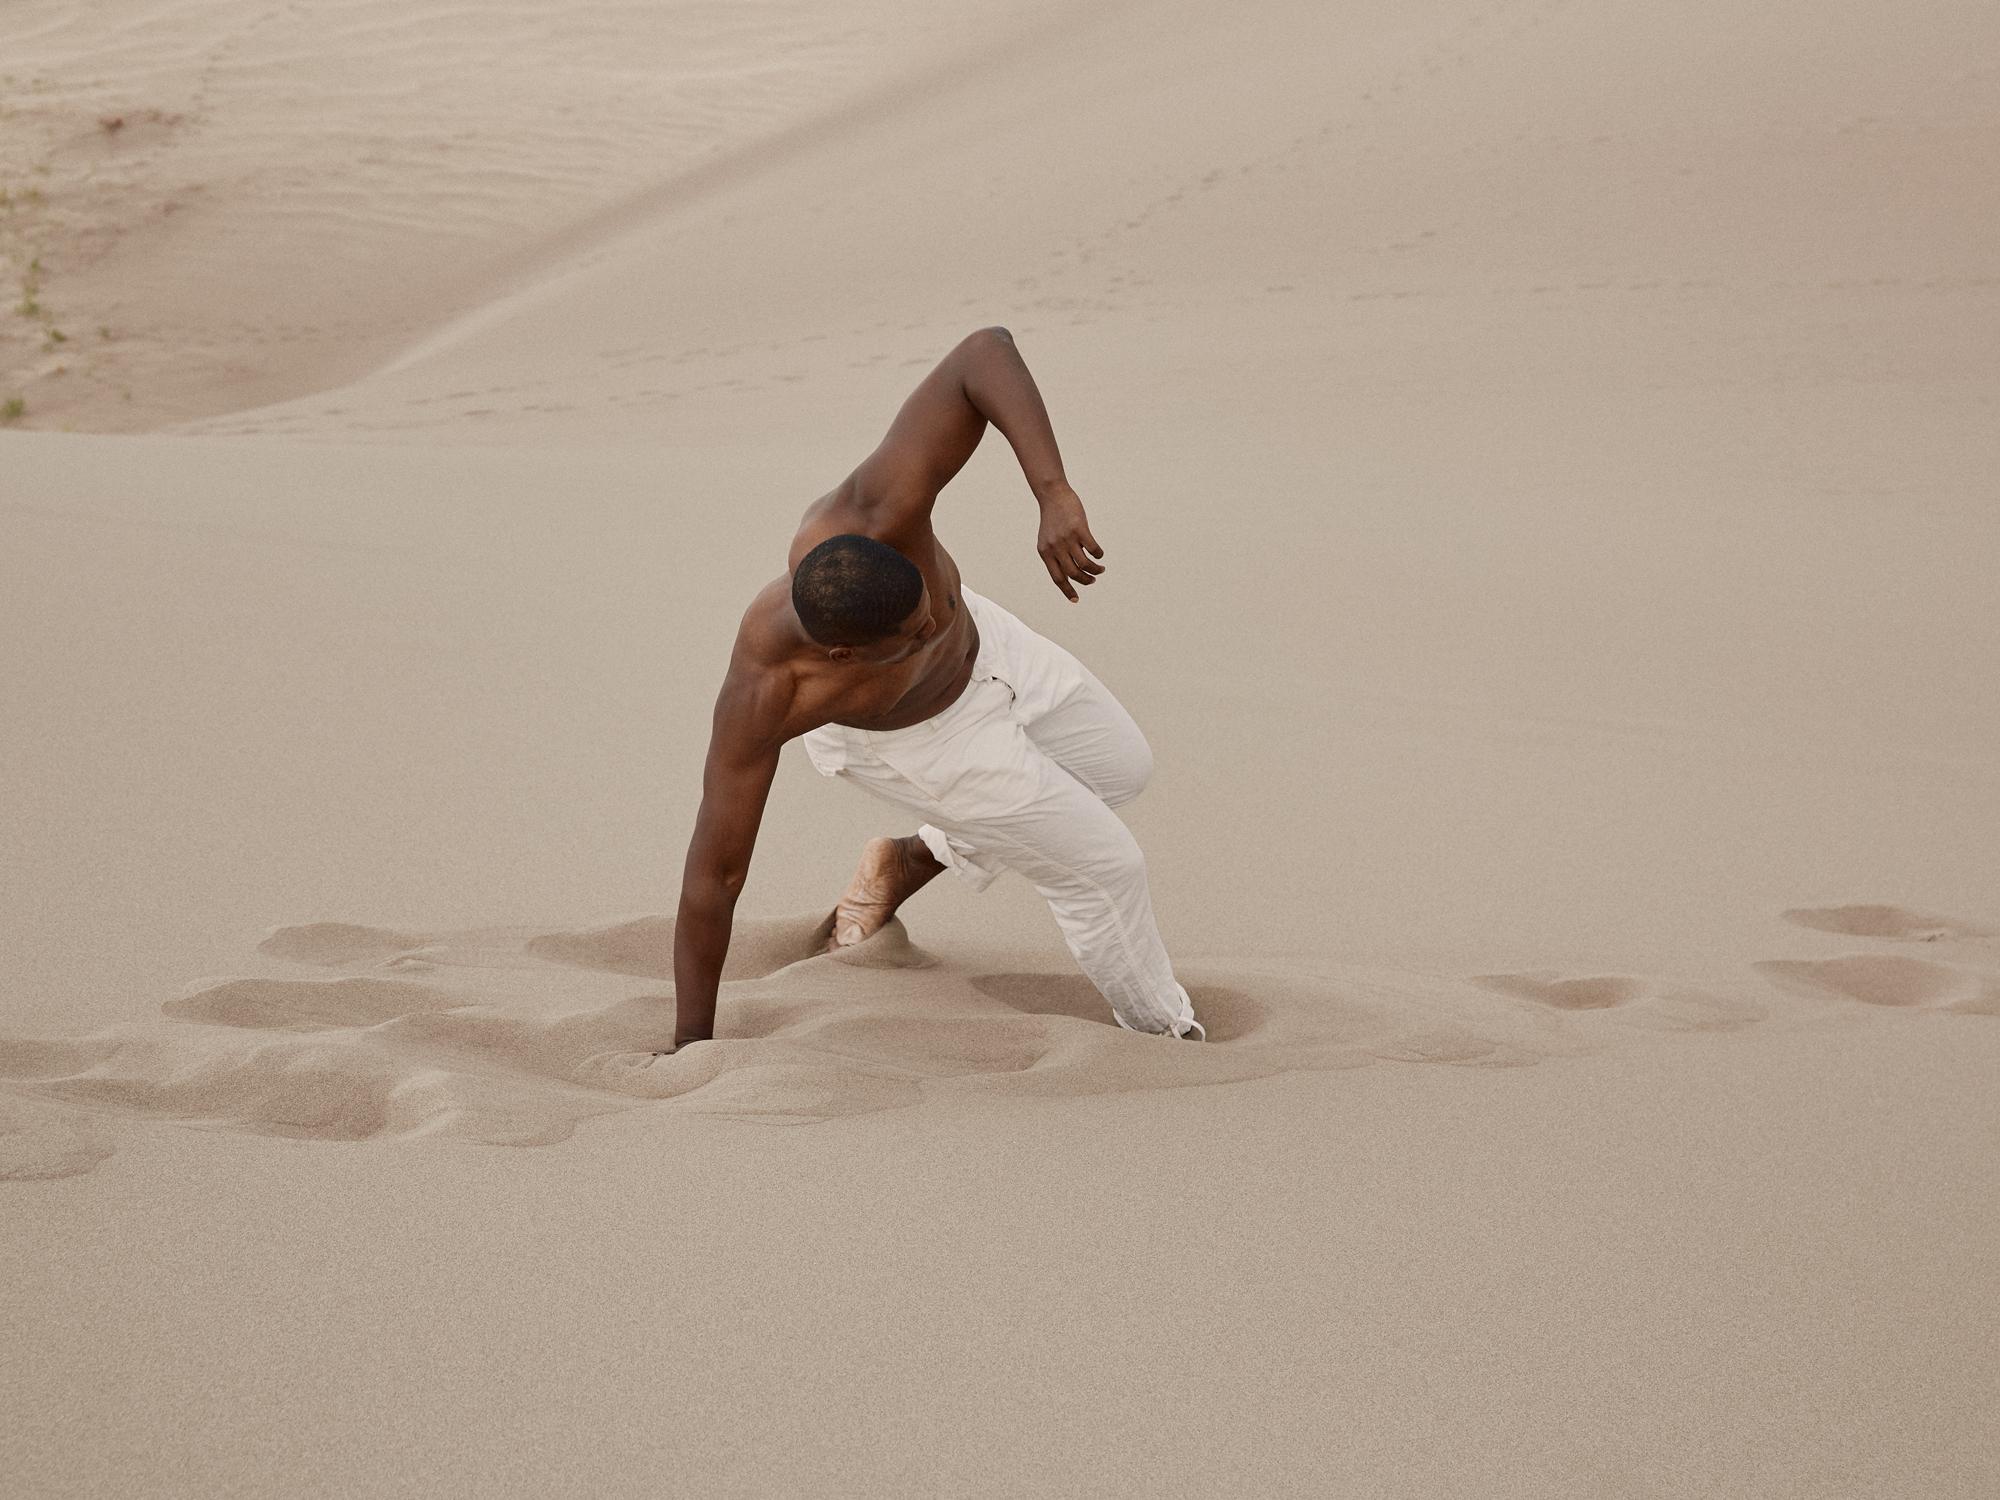 Dune-05.jpg